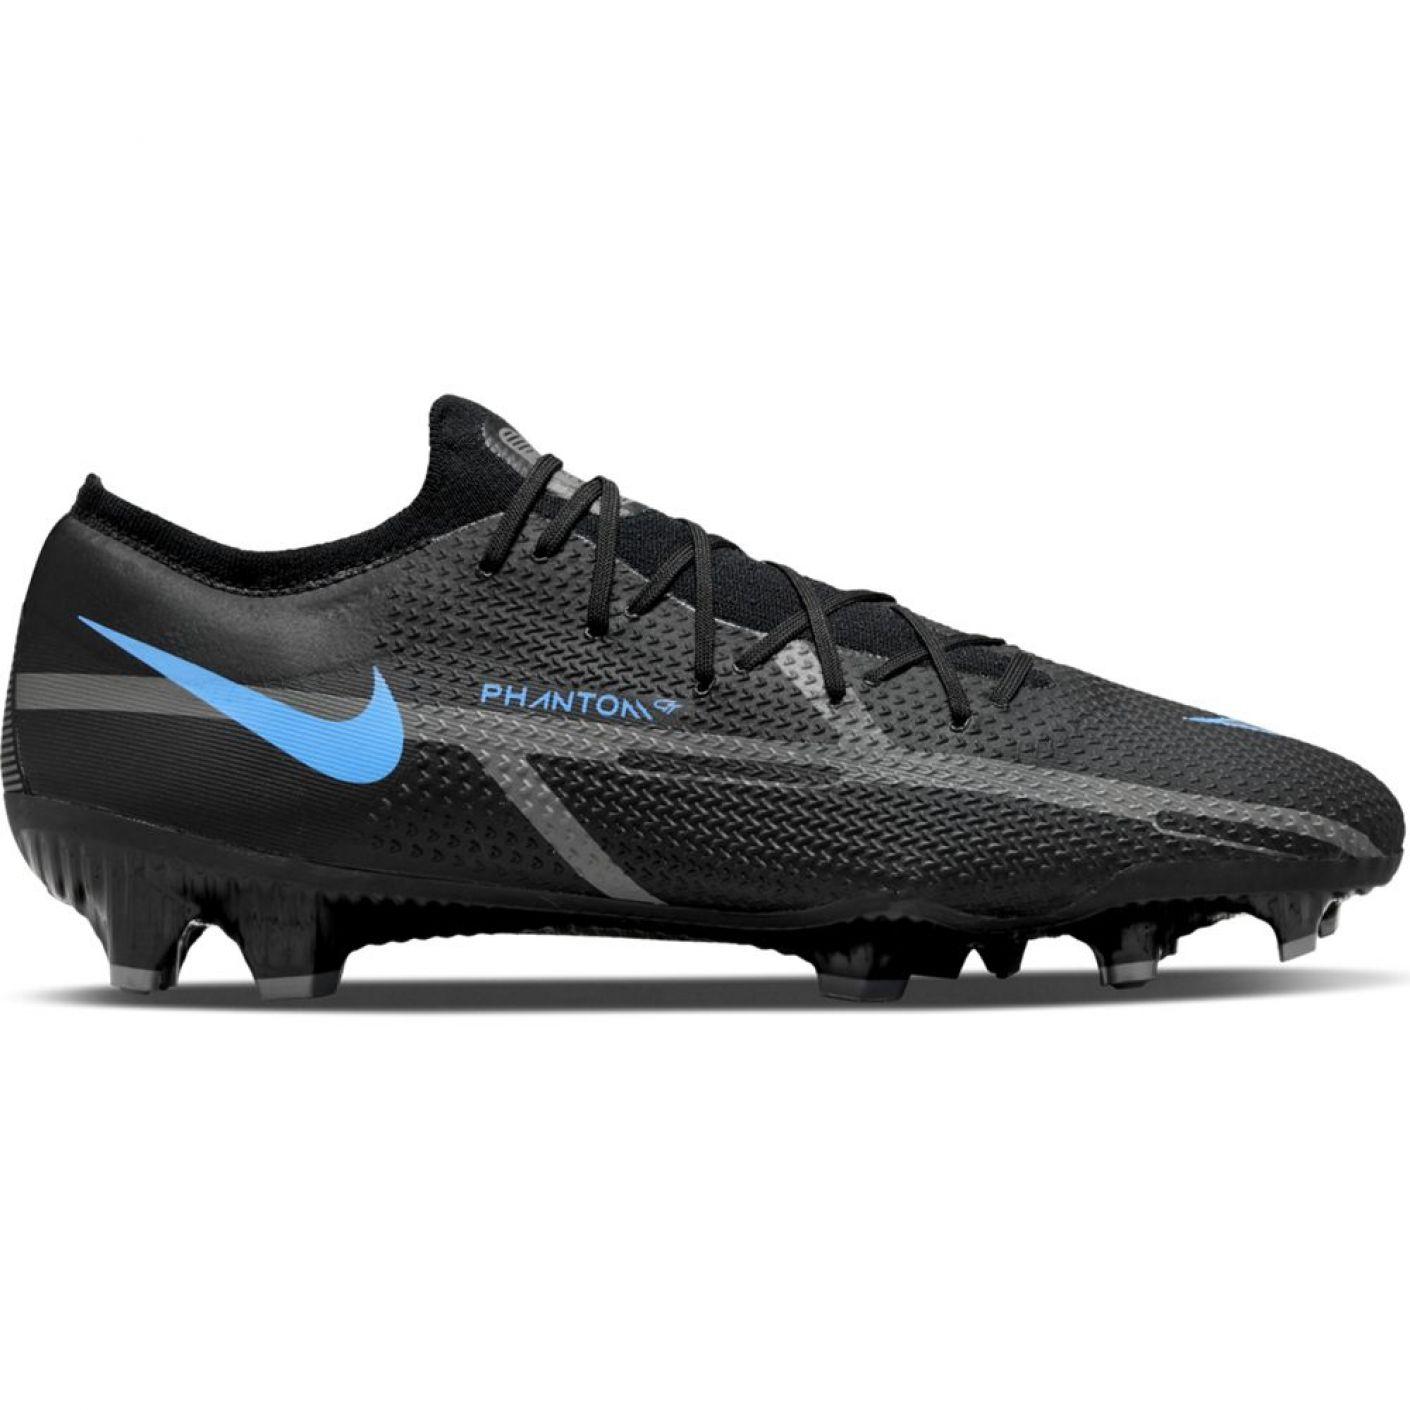 Nike Phantom GT 2 Pro Gras Voetbalschoenen (FG) Zwart Donkergrijs